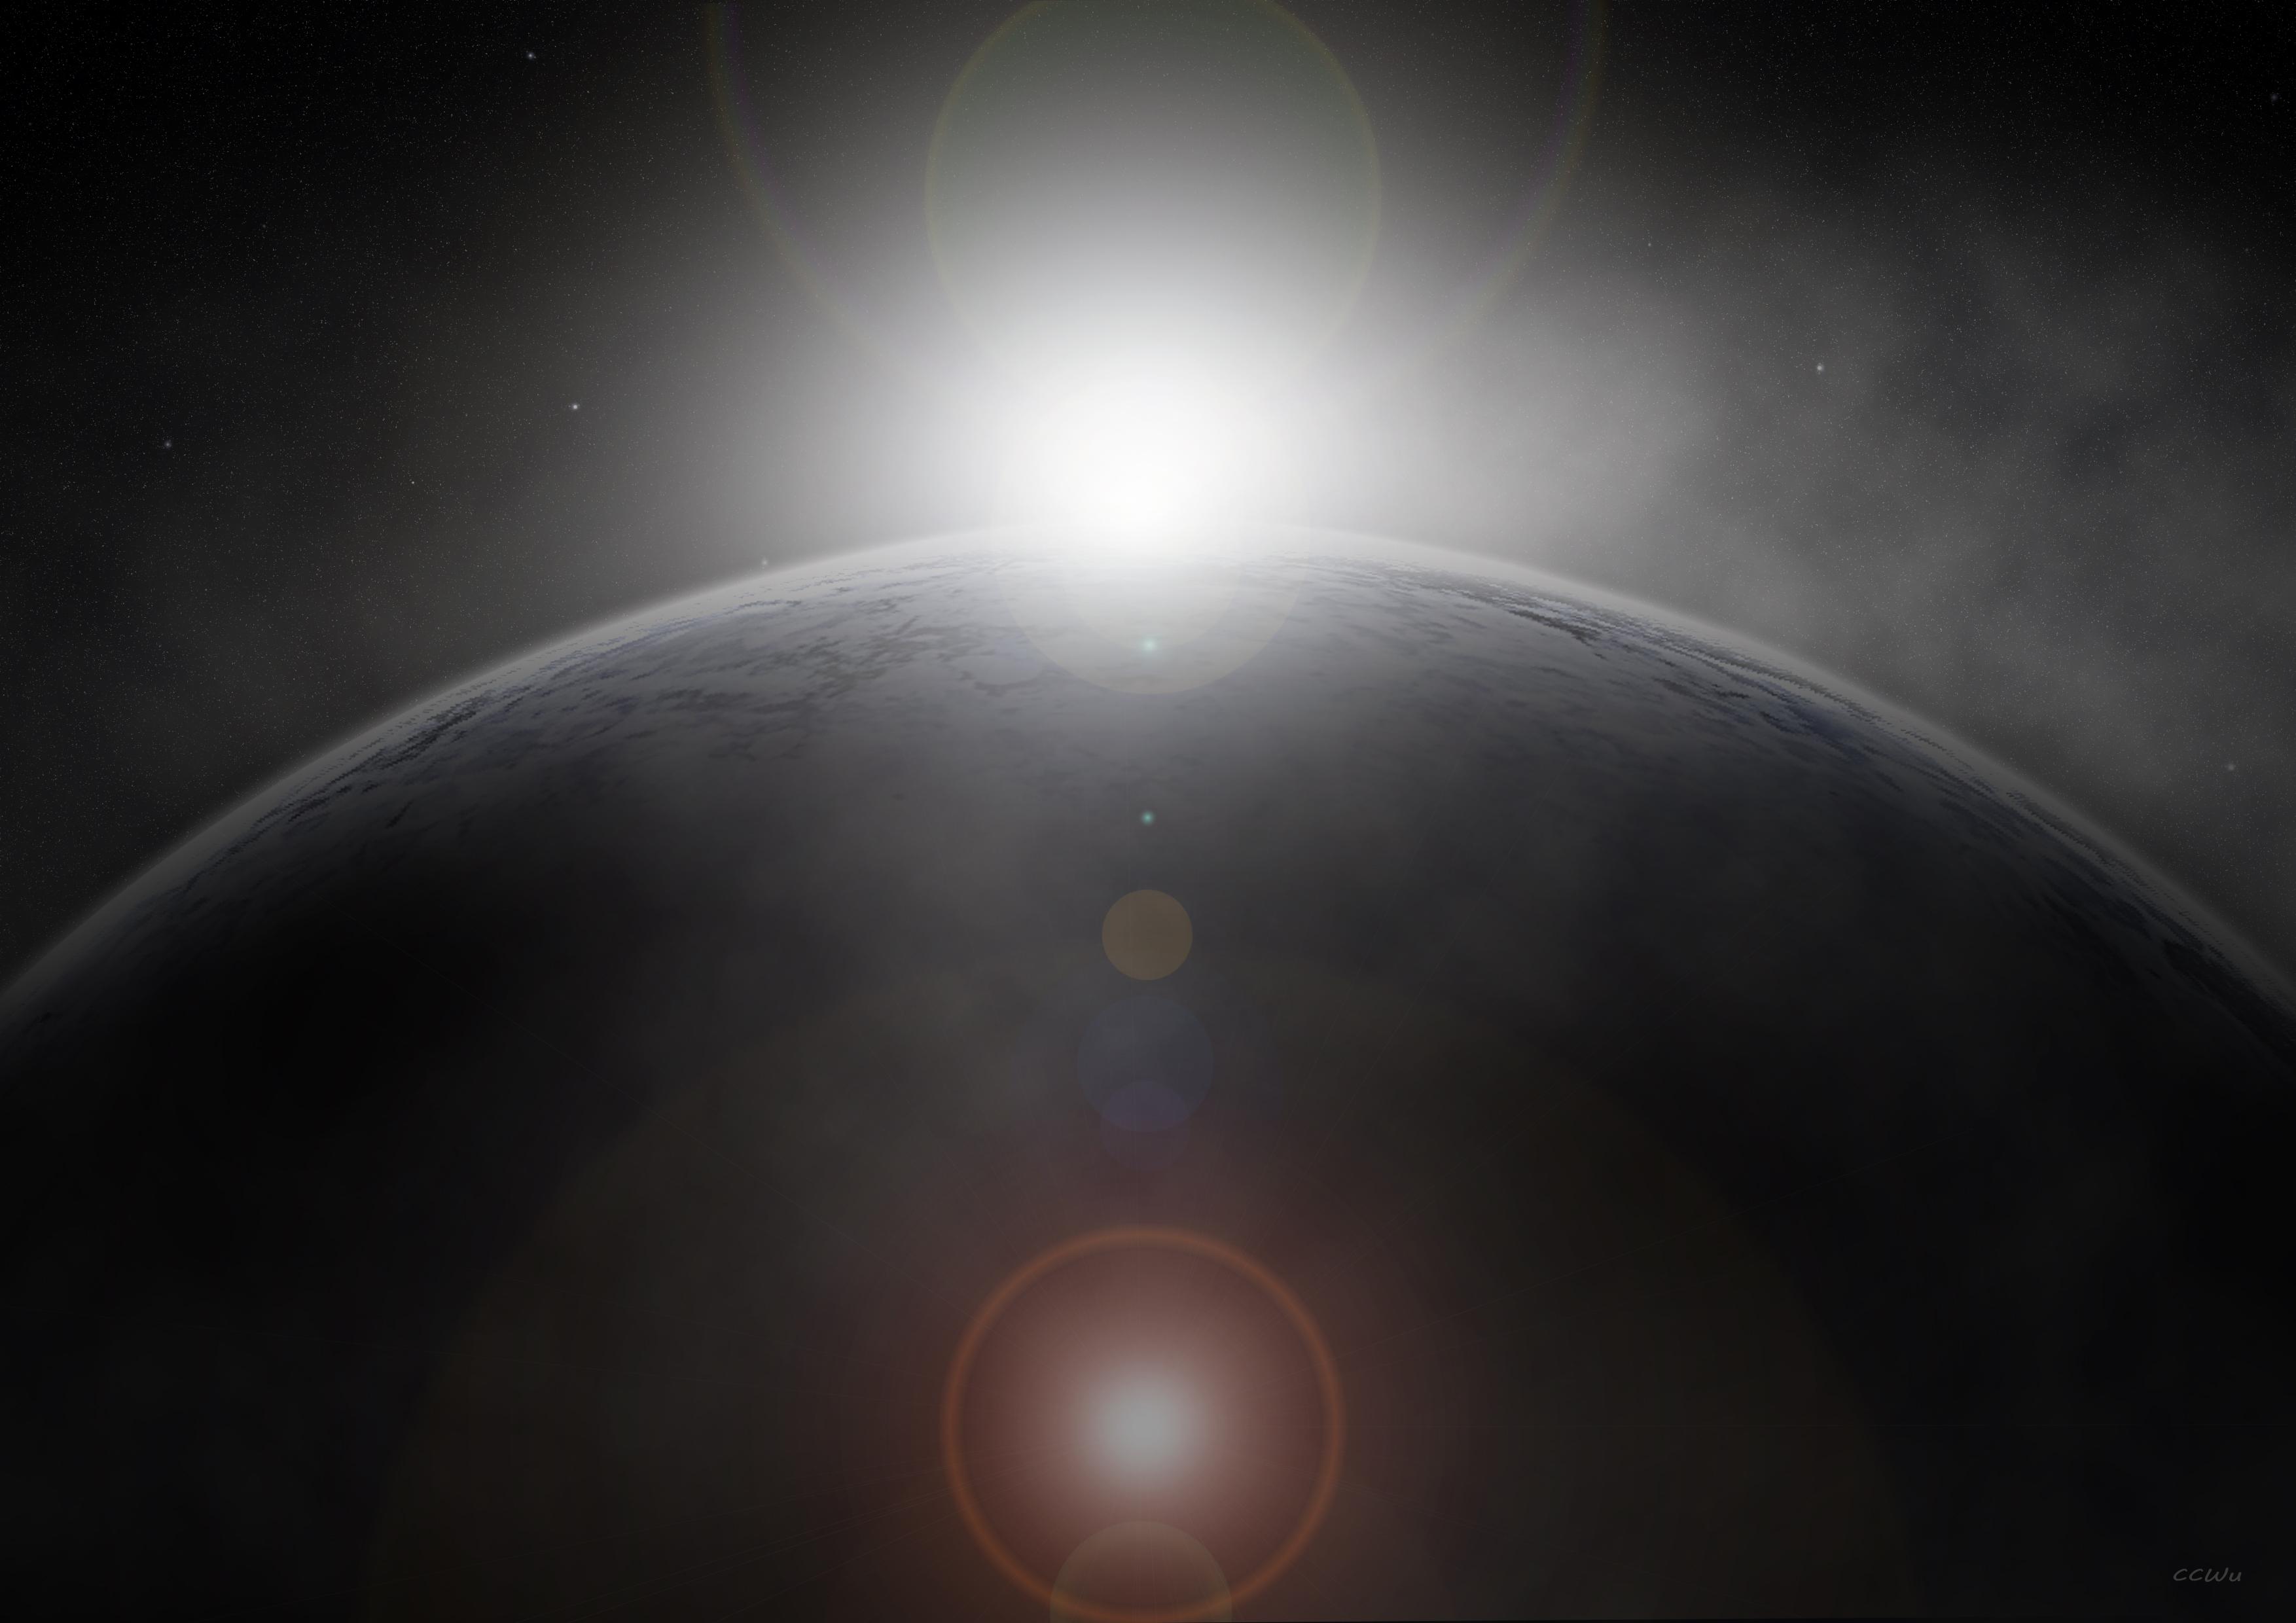 [Study] The Frozen Planet